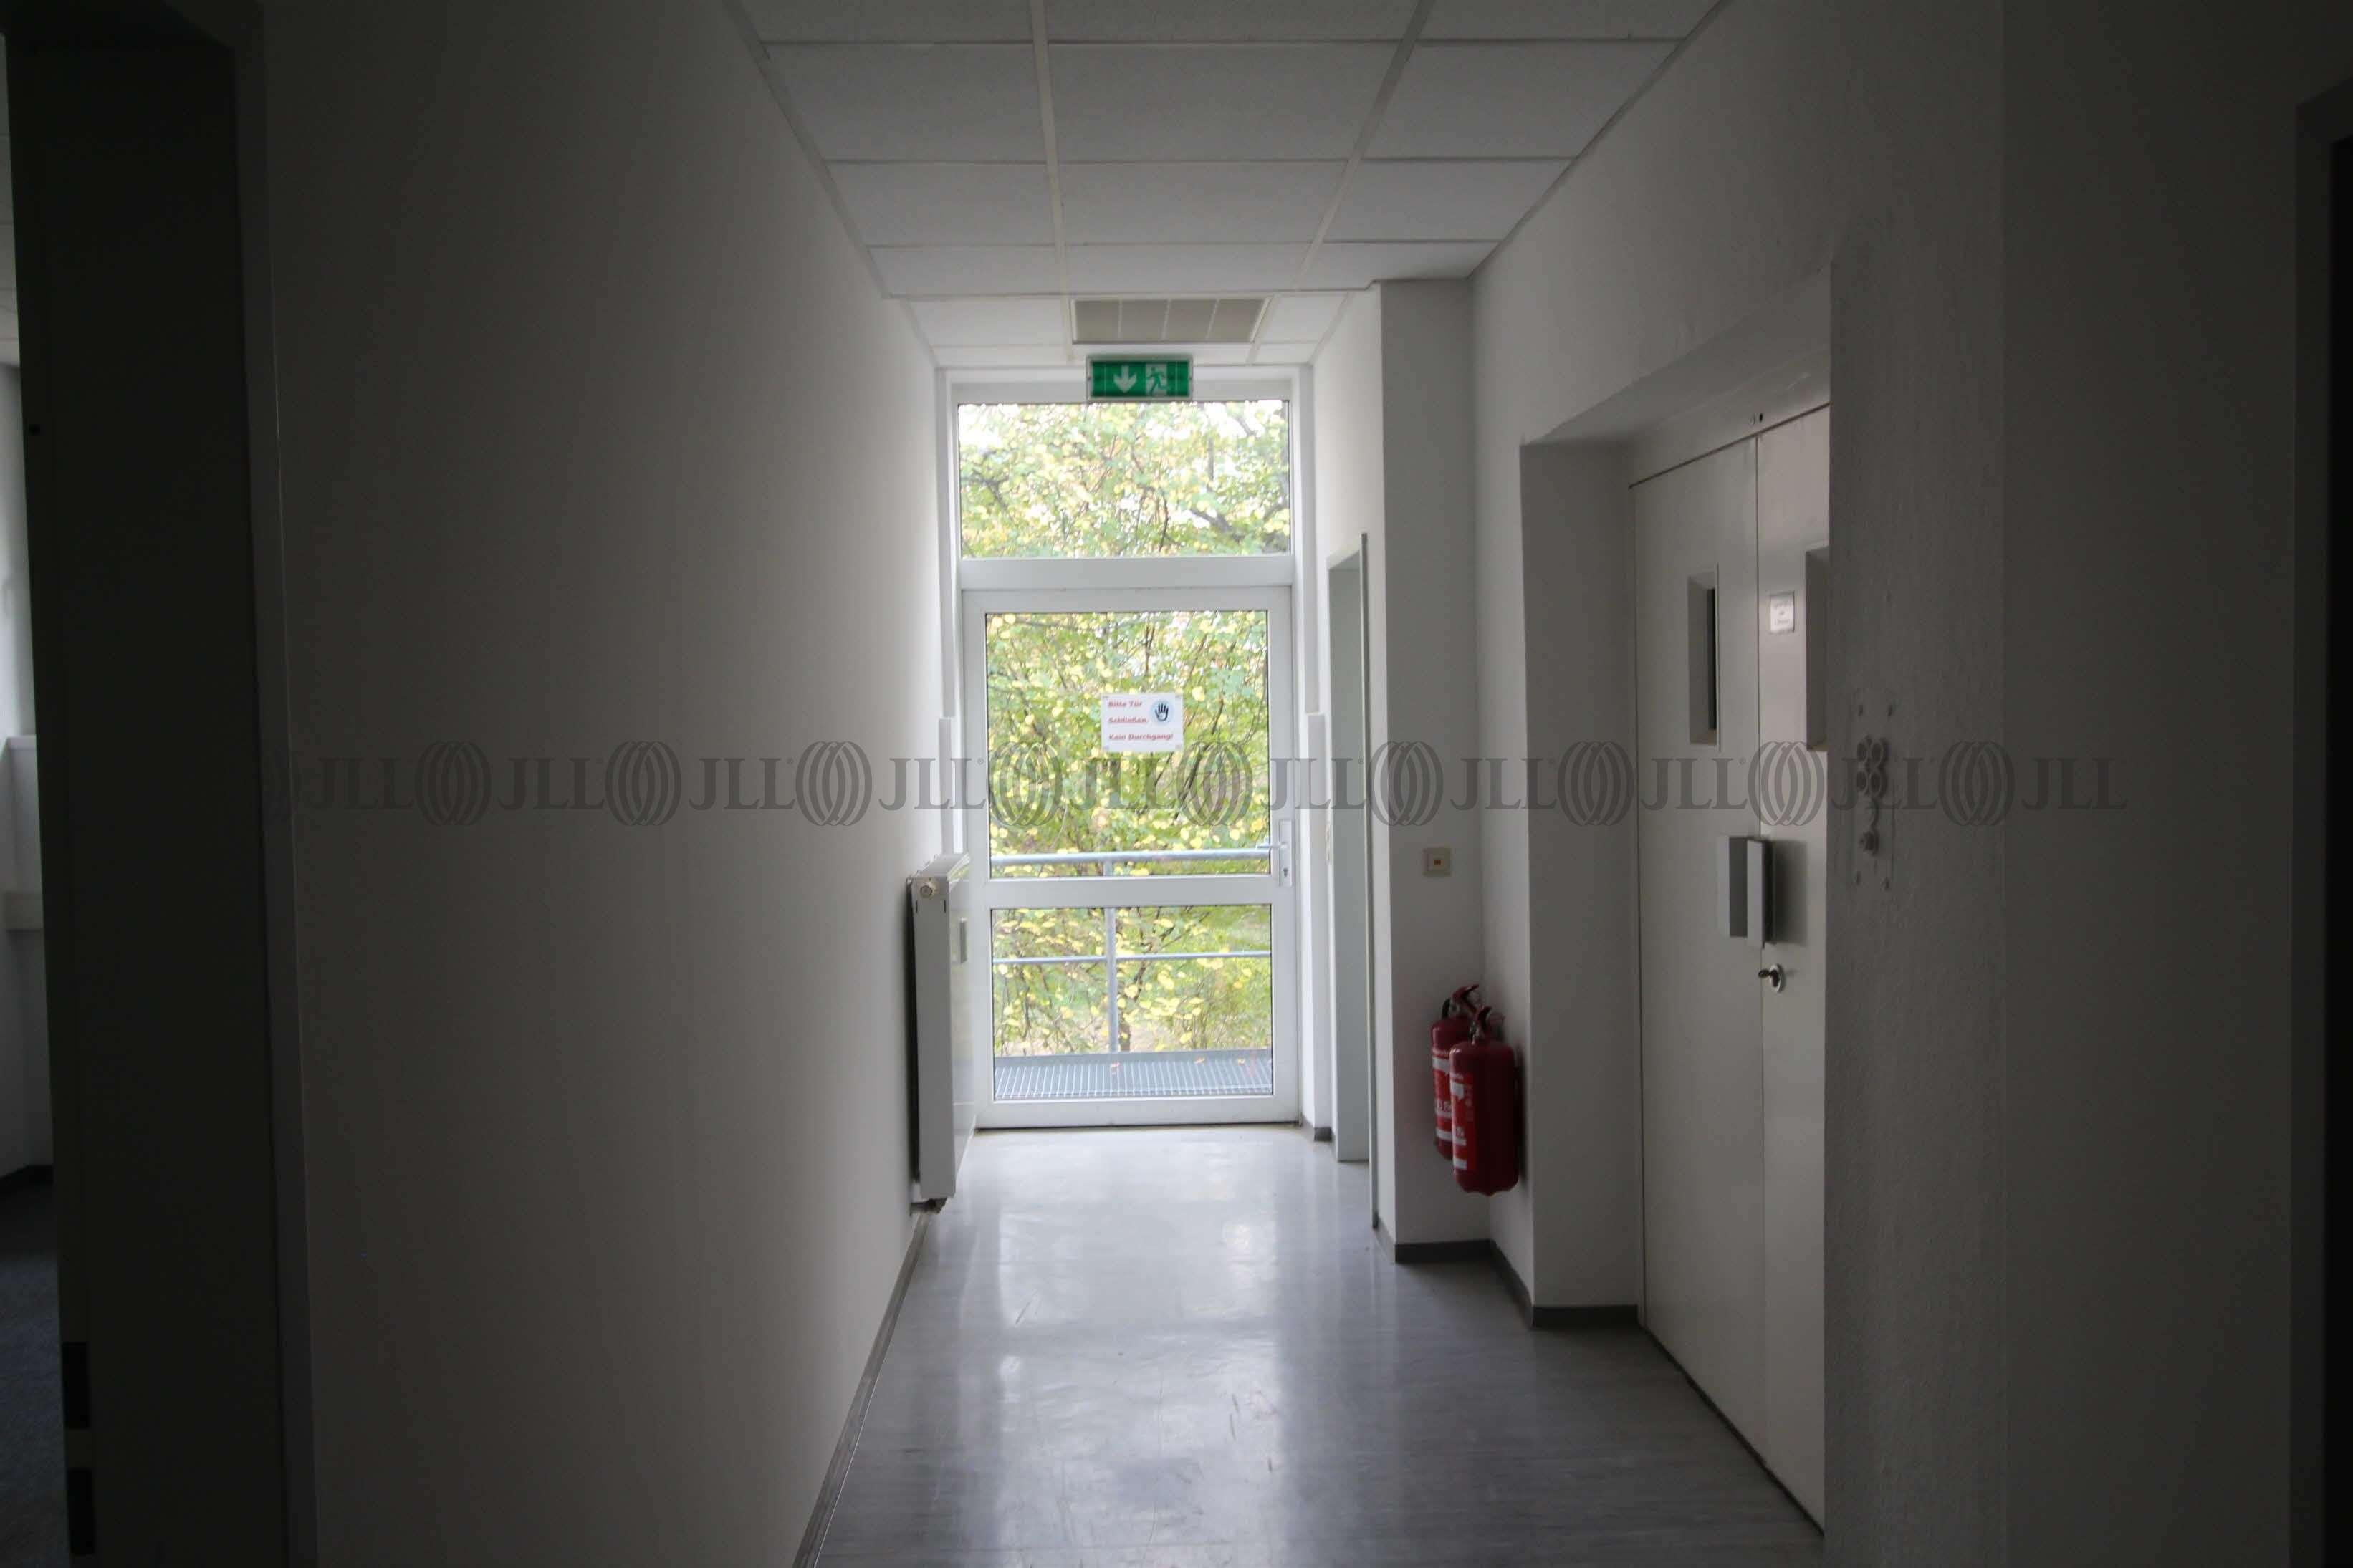 Büros Chemnitz, sachs, 09111 - Büro - Chemnitz, Sachs, Zentrum - B1544 - 9759541